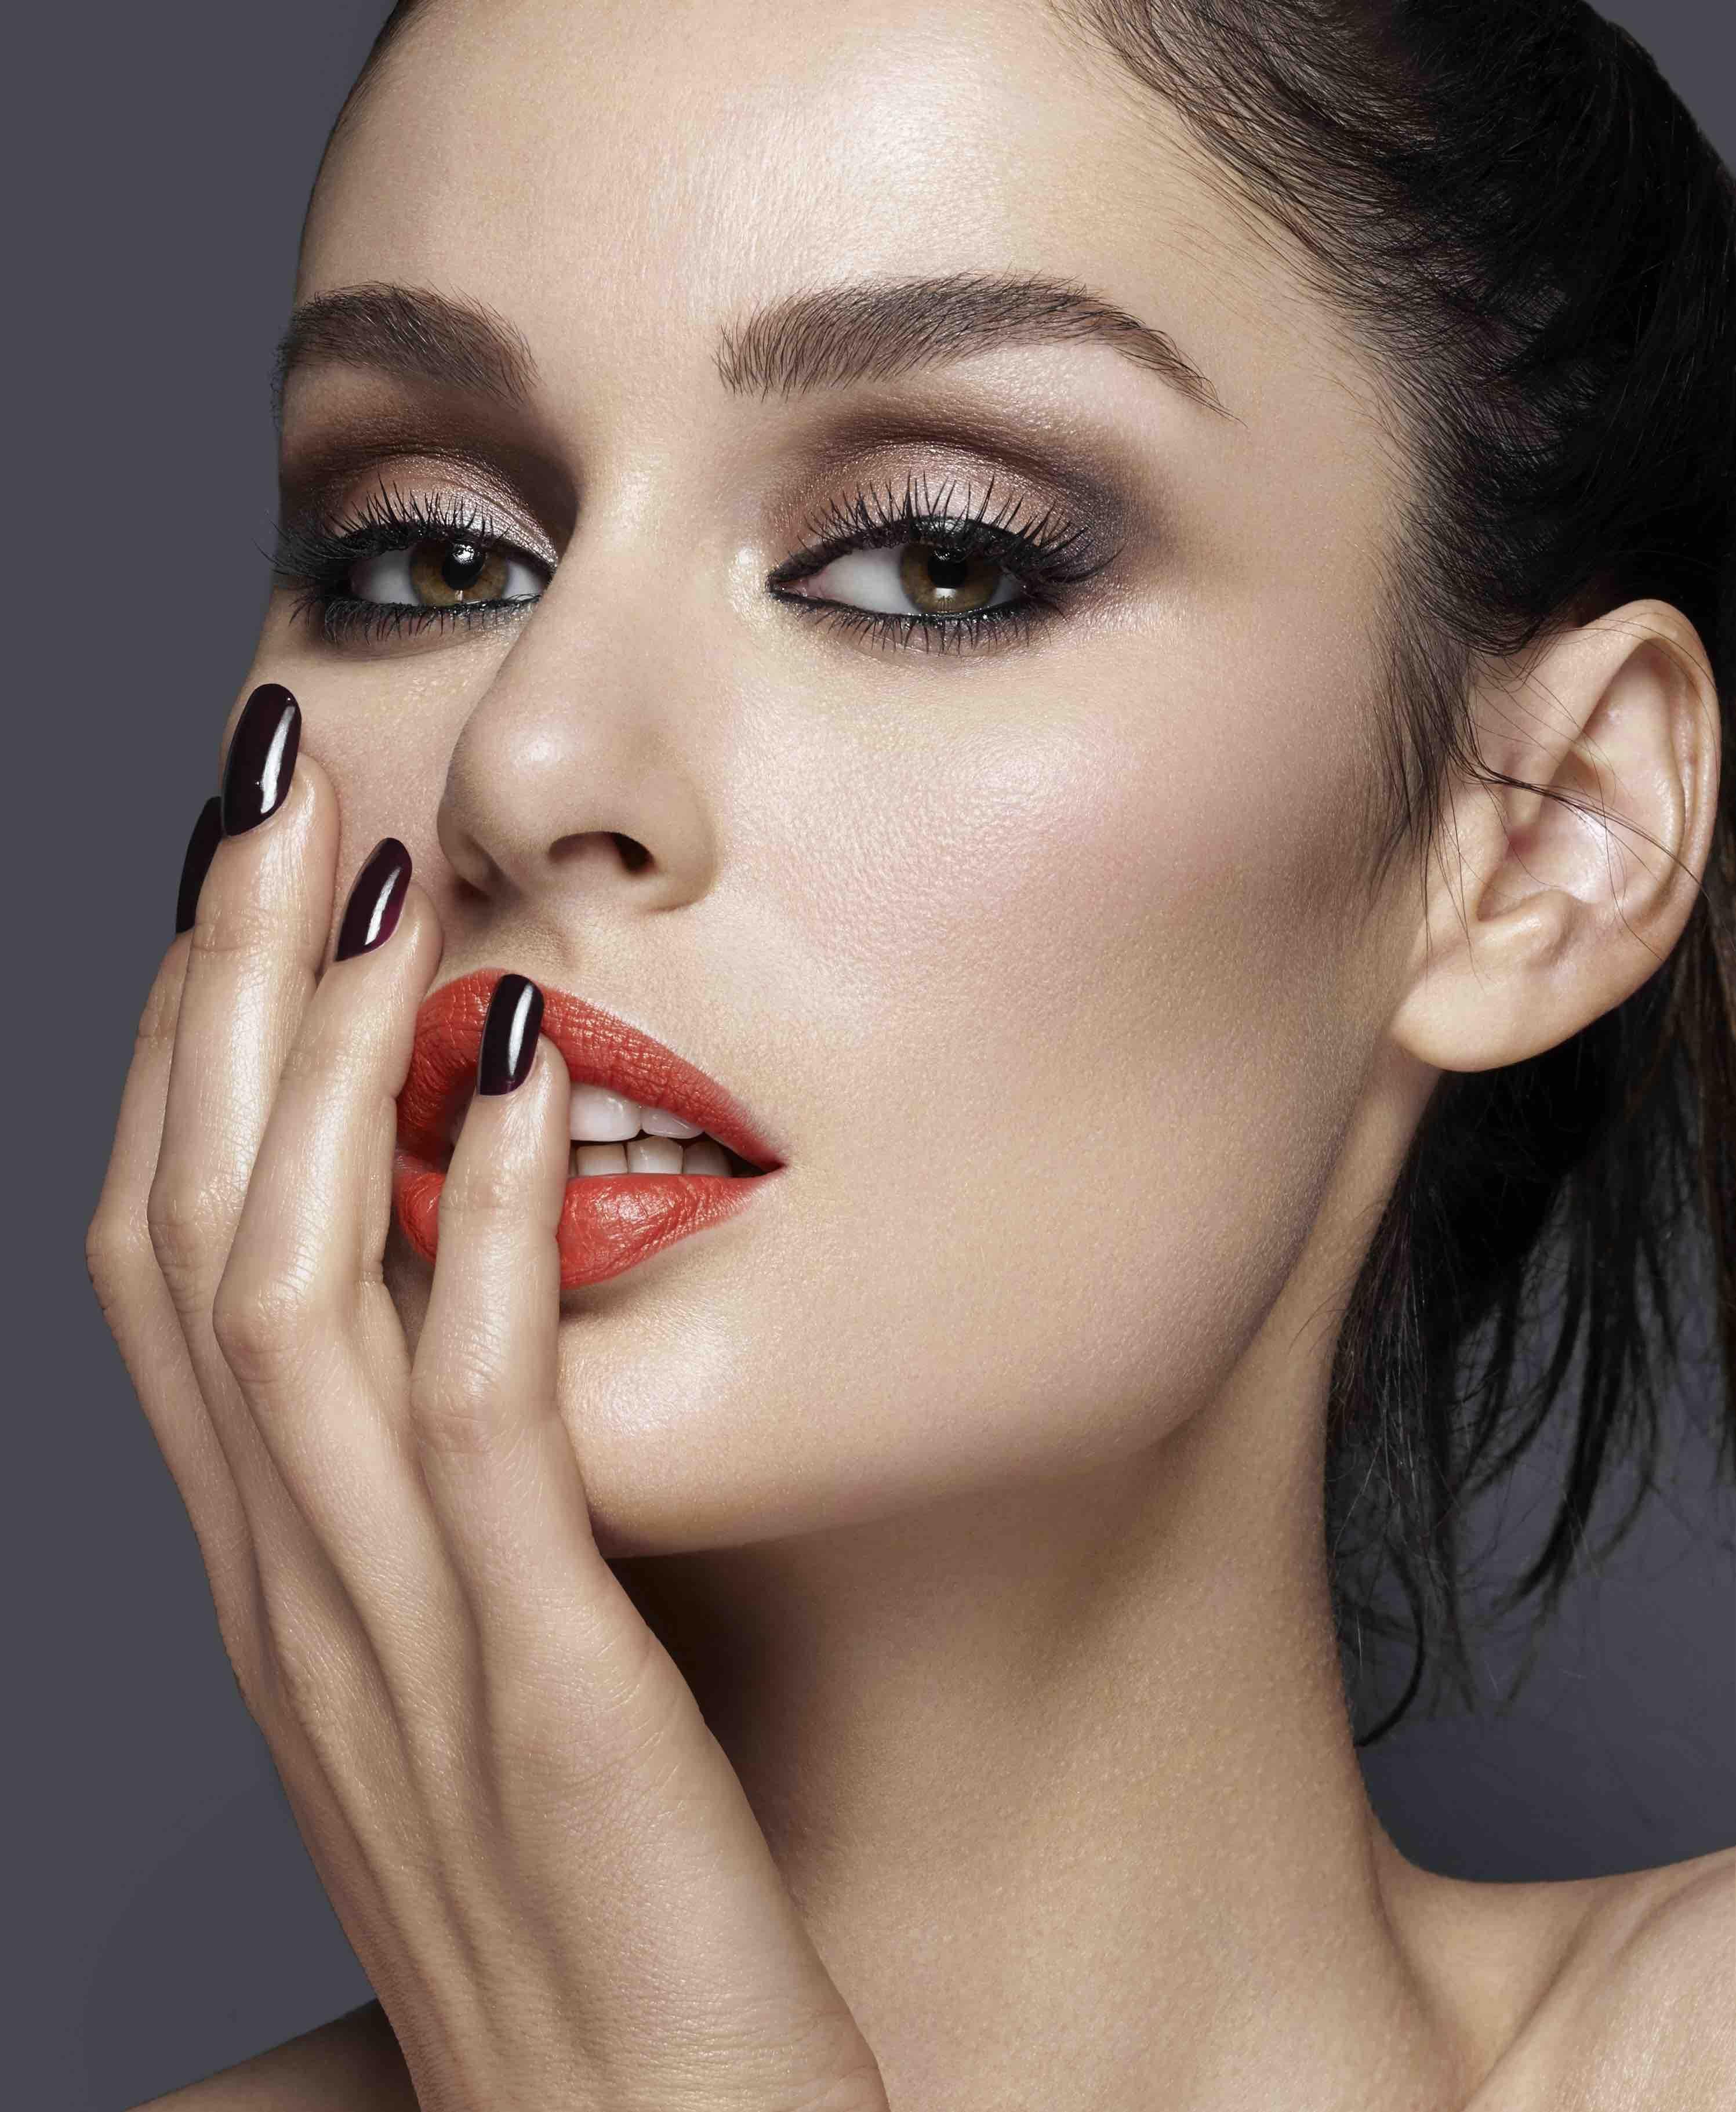 Nicole trunfio, shot by gavin oneil, for Rae Morris makeup book